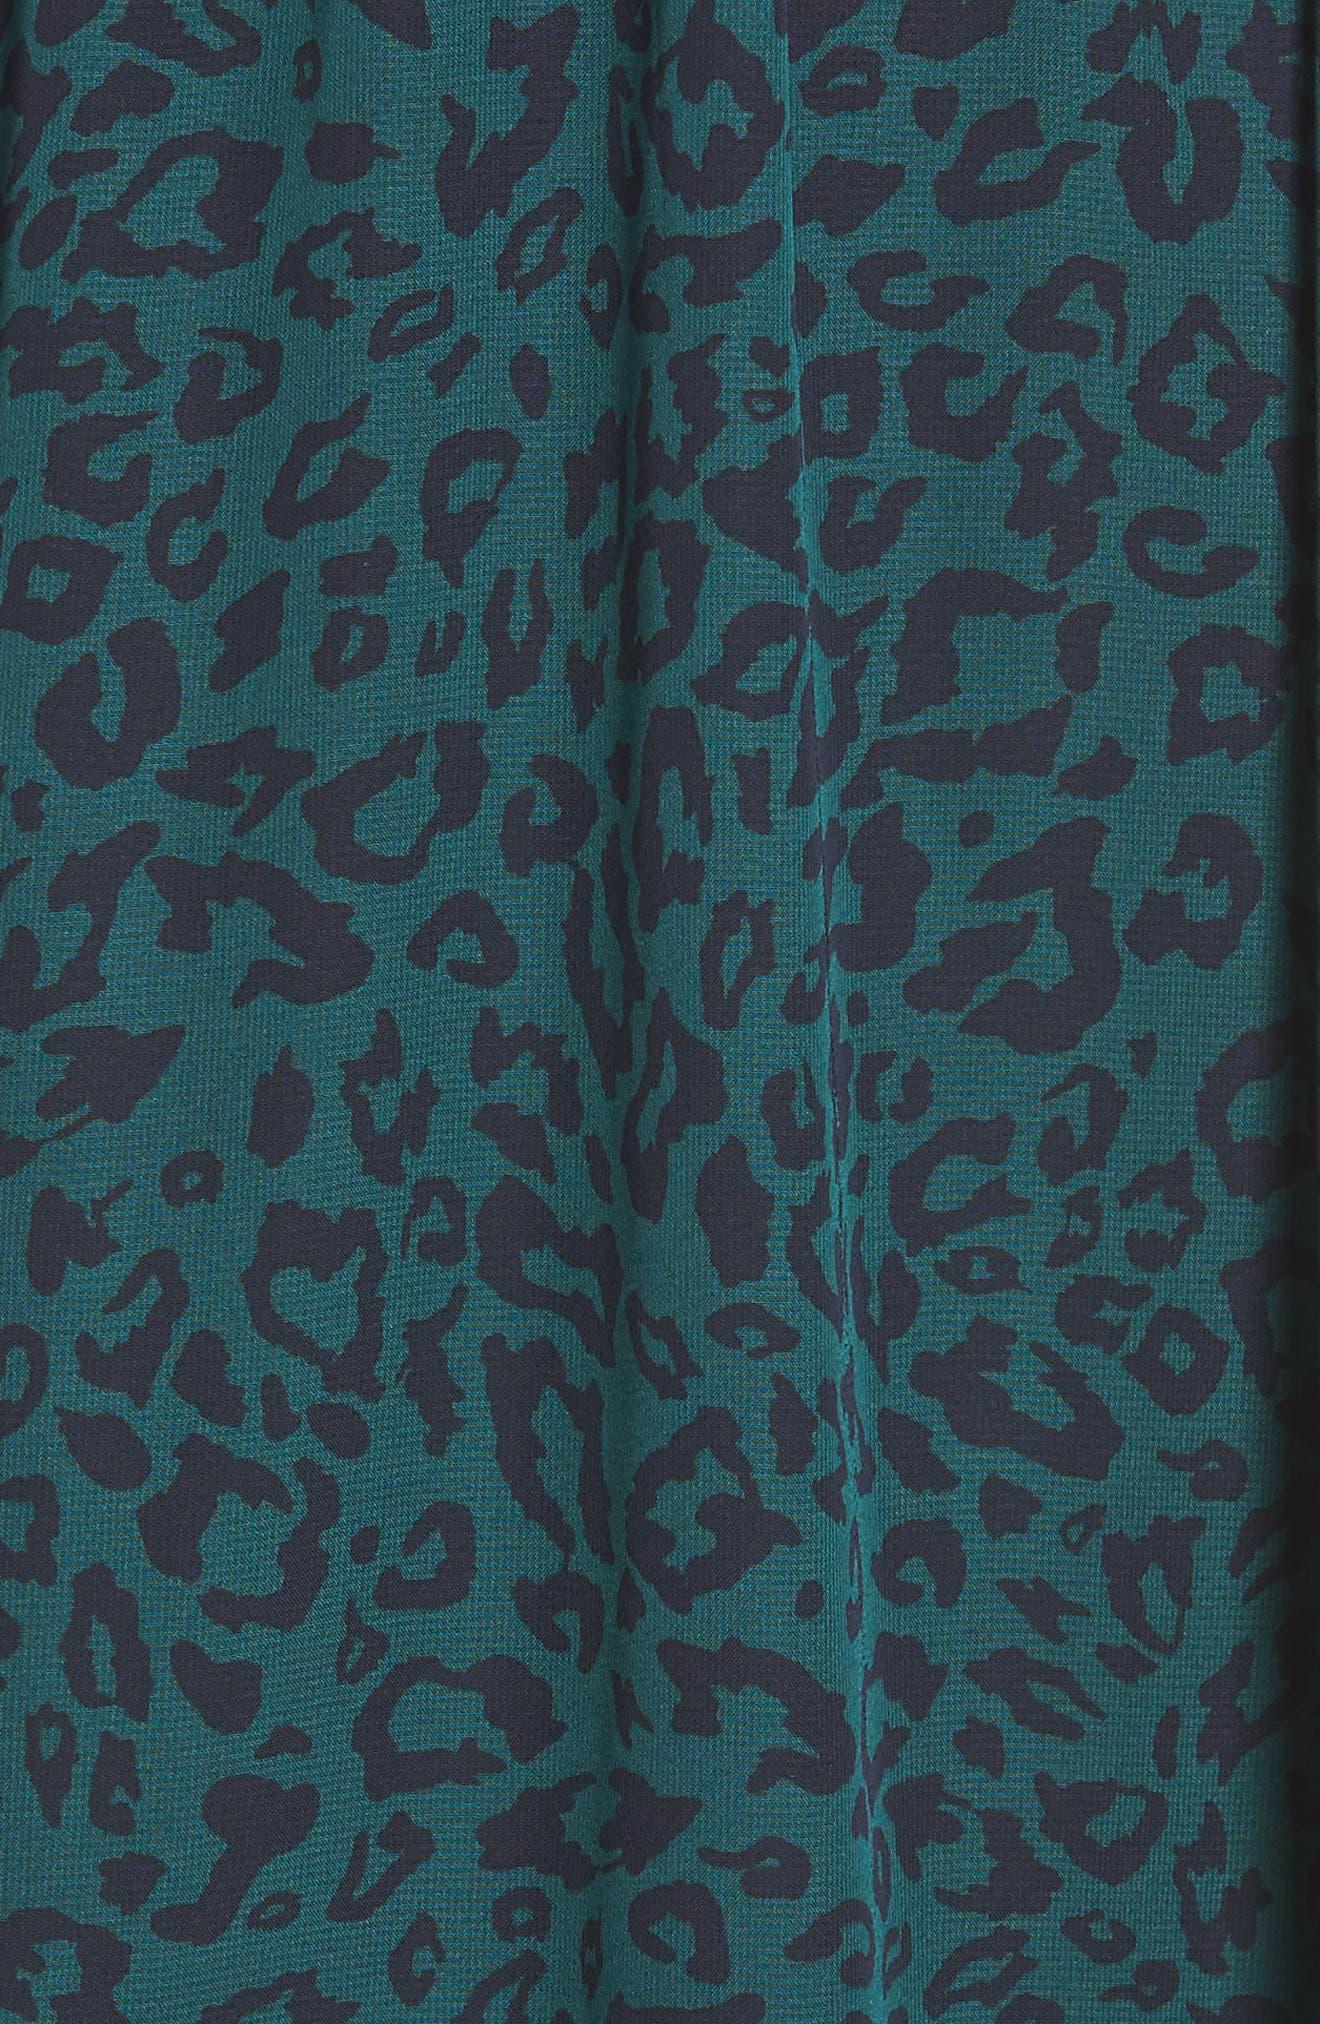 Leopard Print Smocked Dress,                             Alternate thumbnail 6, color,                             GREEN LEOPARD